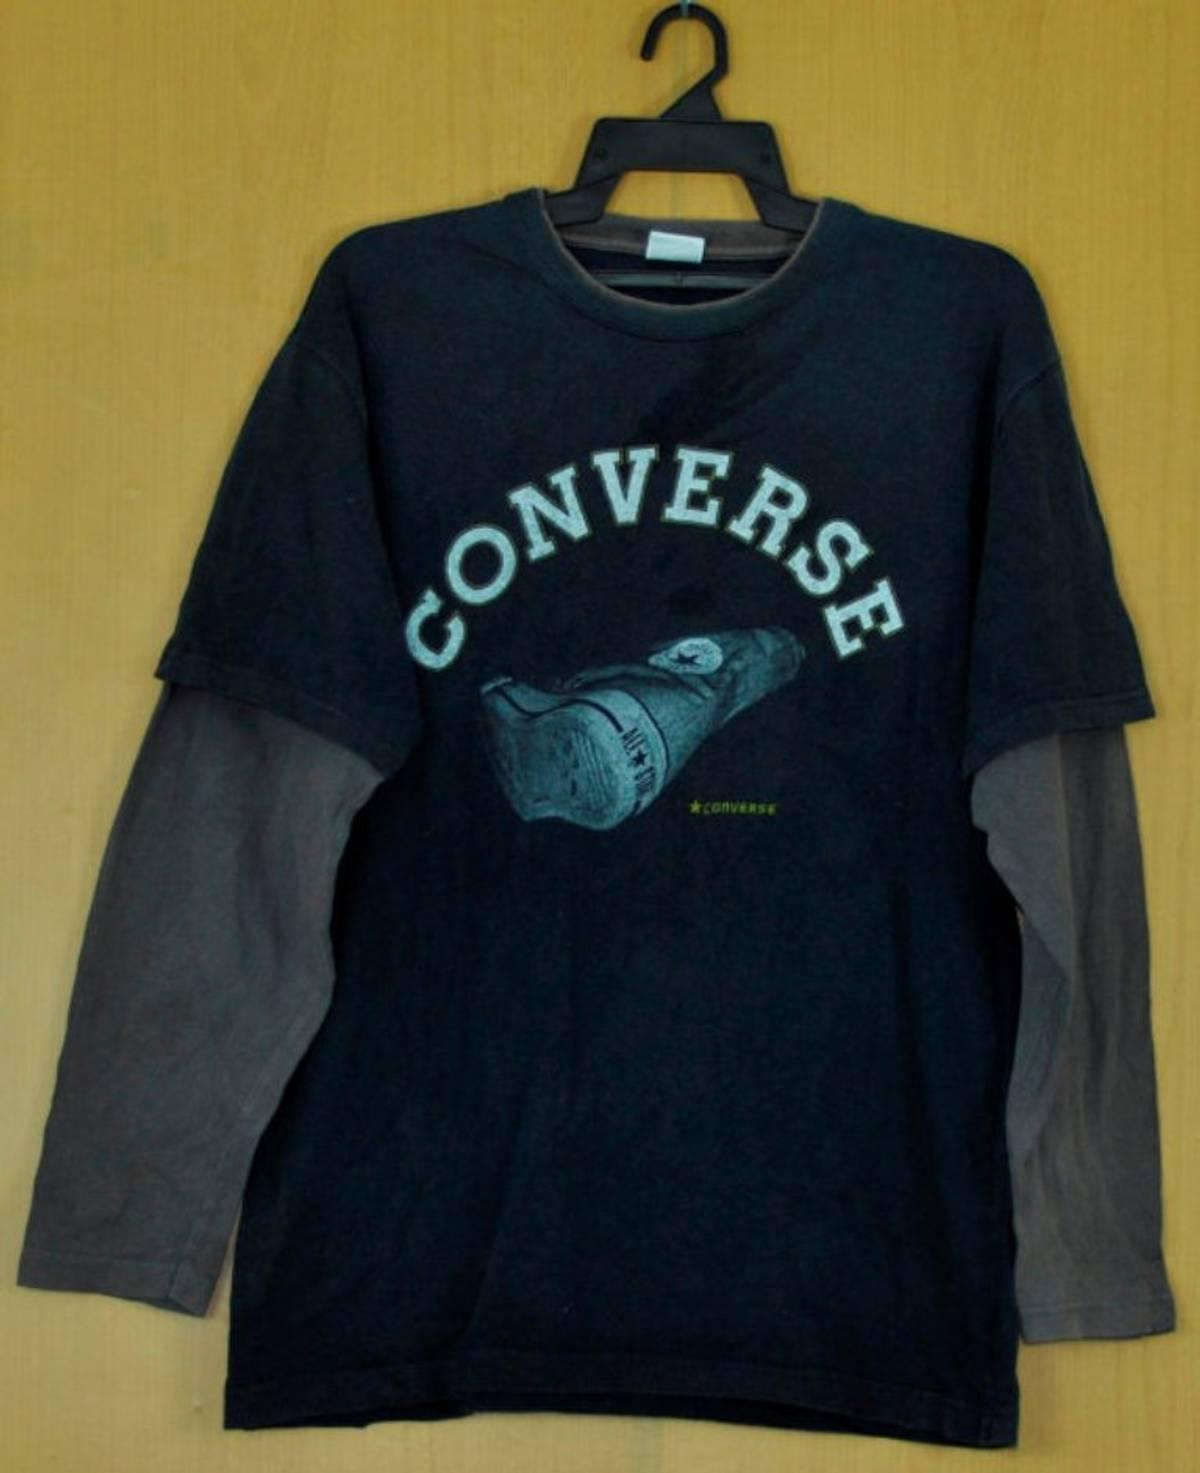 tornillo Pogo stick jump Posesión  Converse Vintage Converse T Shirt Long Slave Shirt Skate Hiphop Surf Puma Adidas  Nike Unisex Clothing Double Large | Grailed